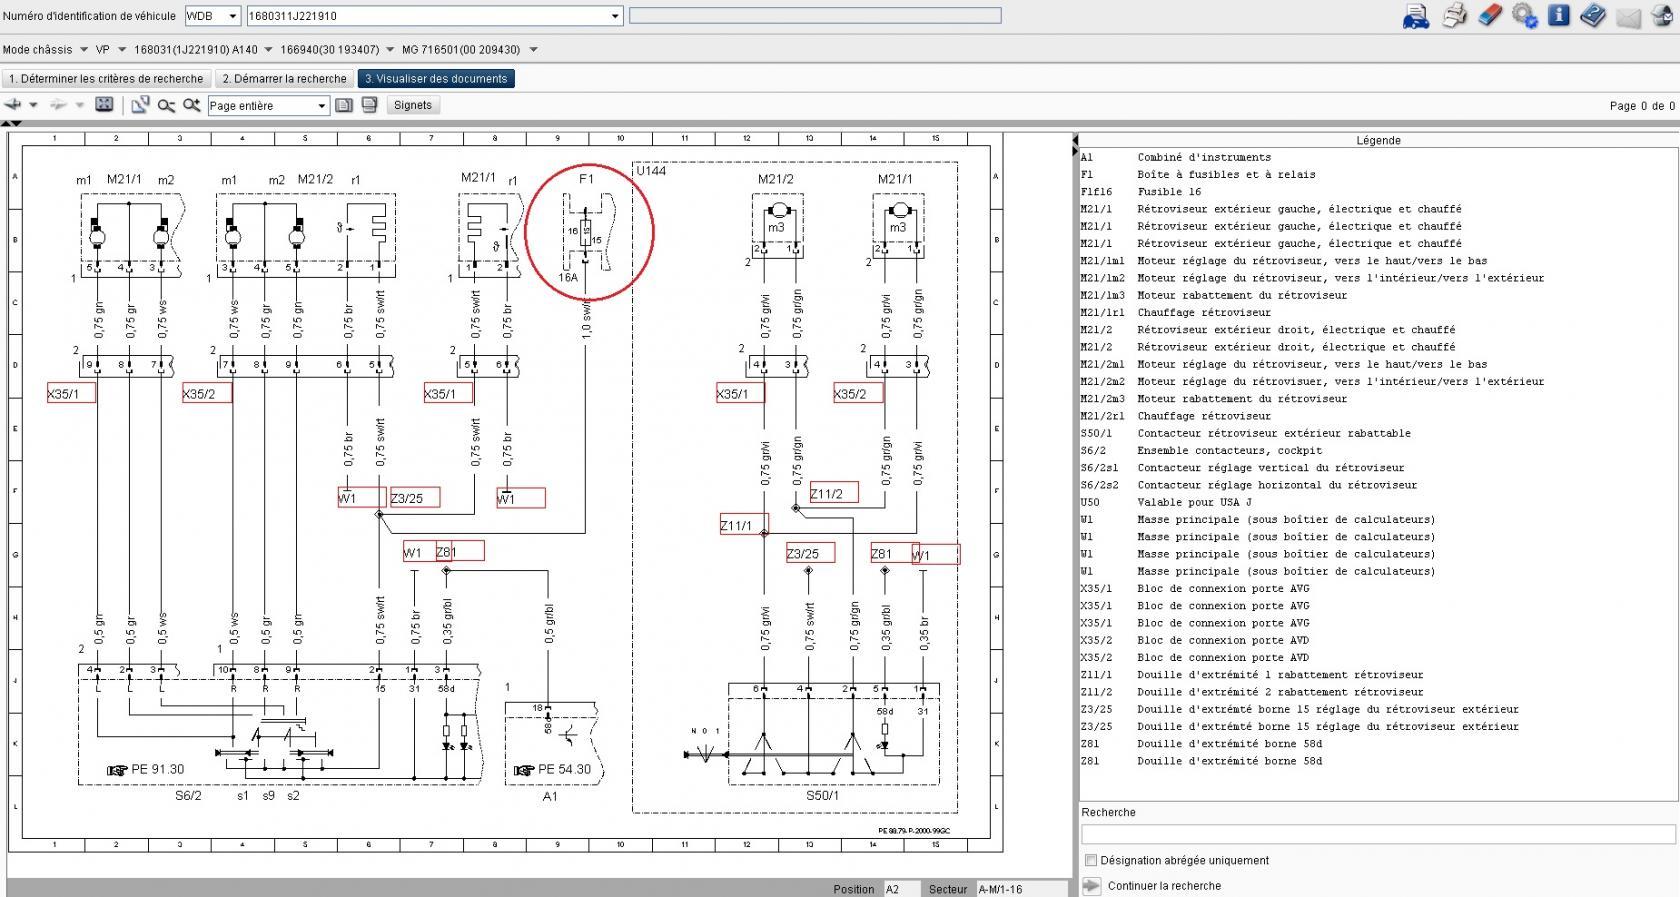 schema-retroviseurs-WDB1680311J221910.jpeg